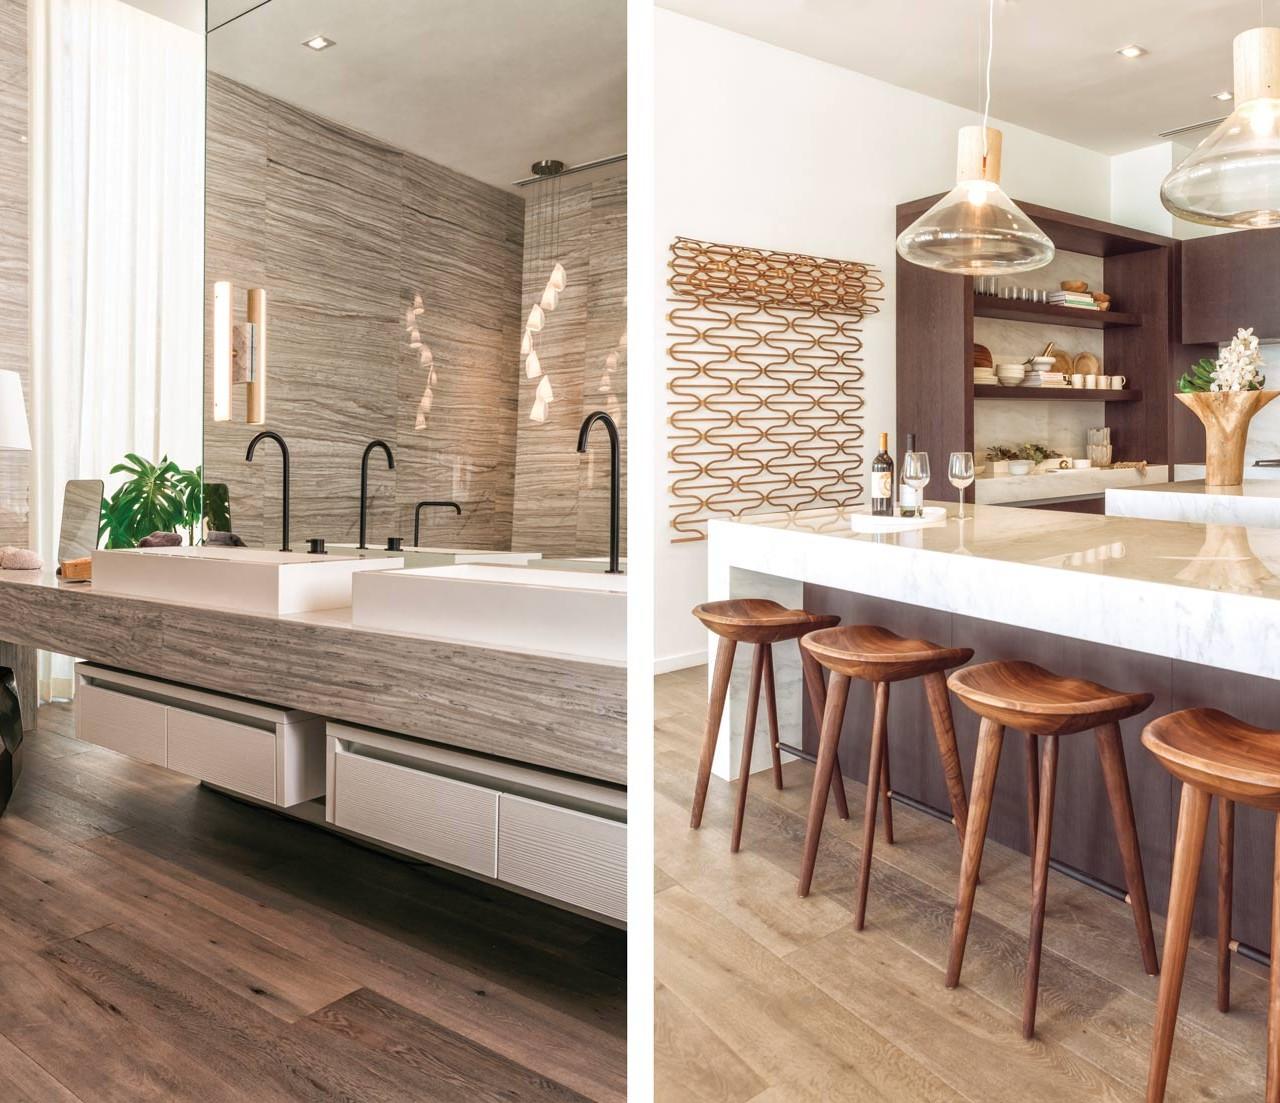 auberge-residence-kitch-bath